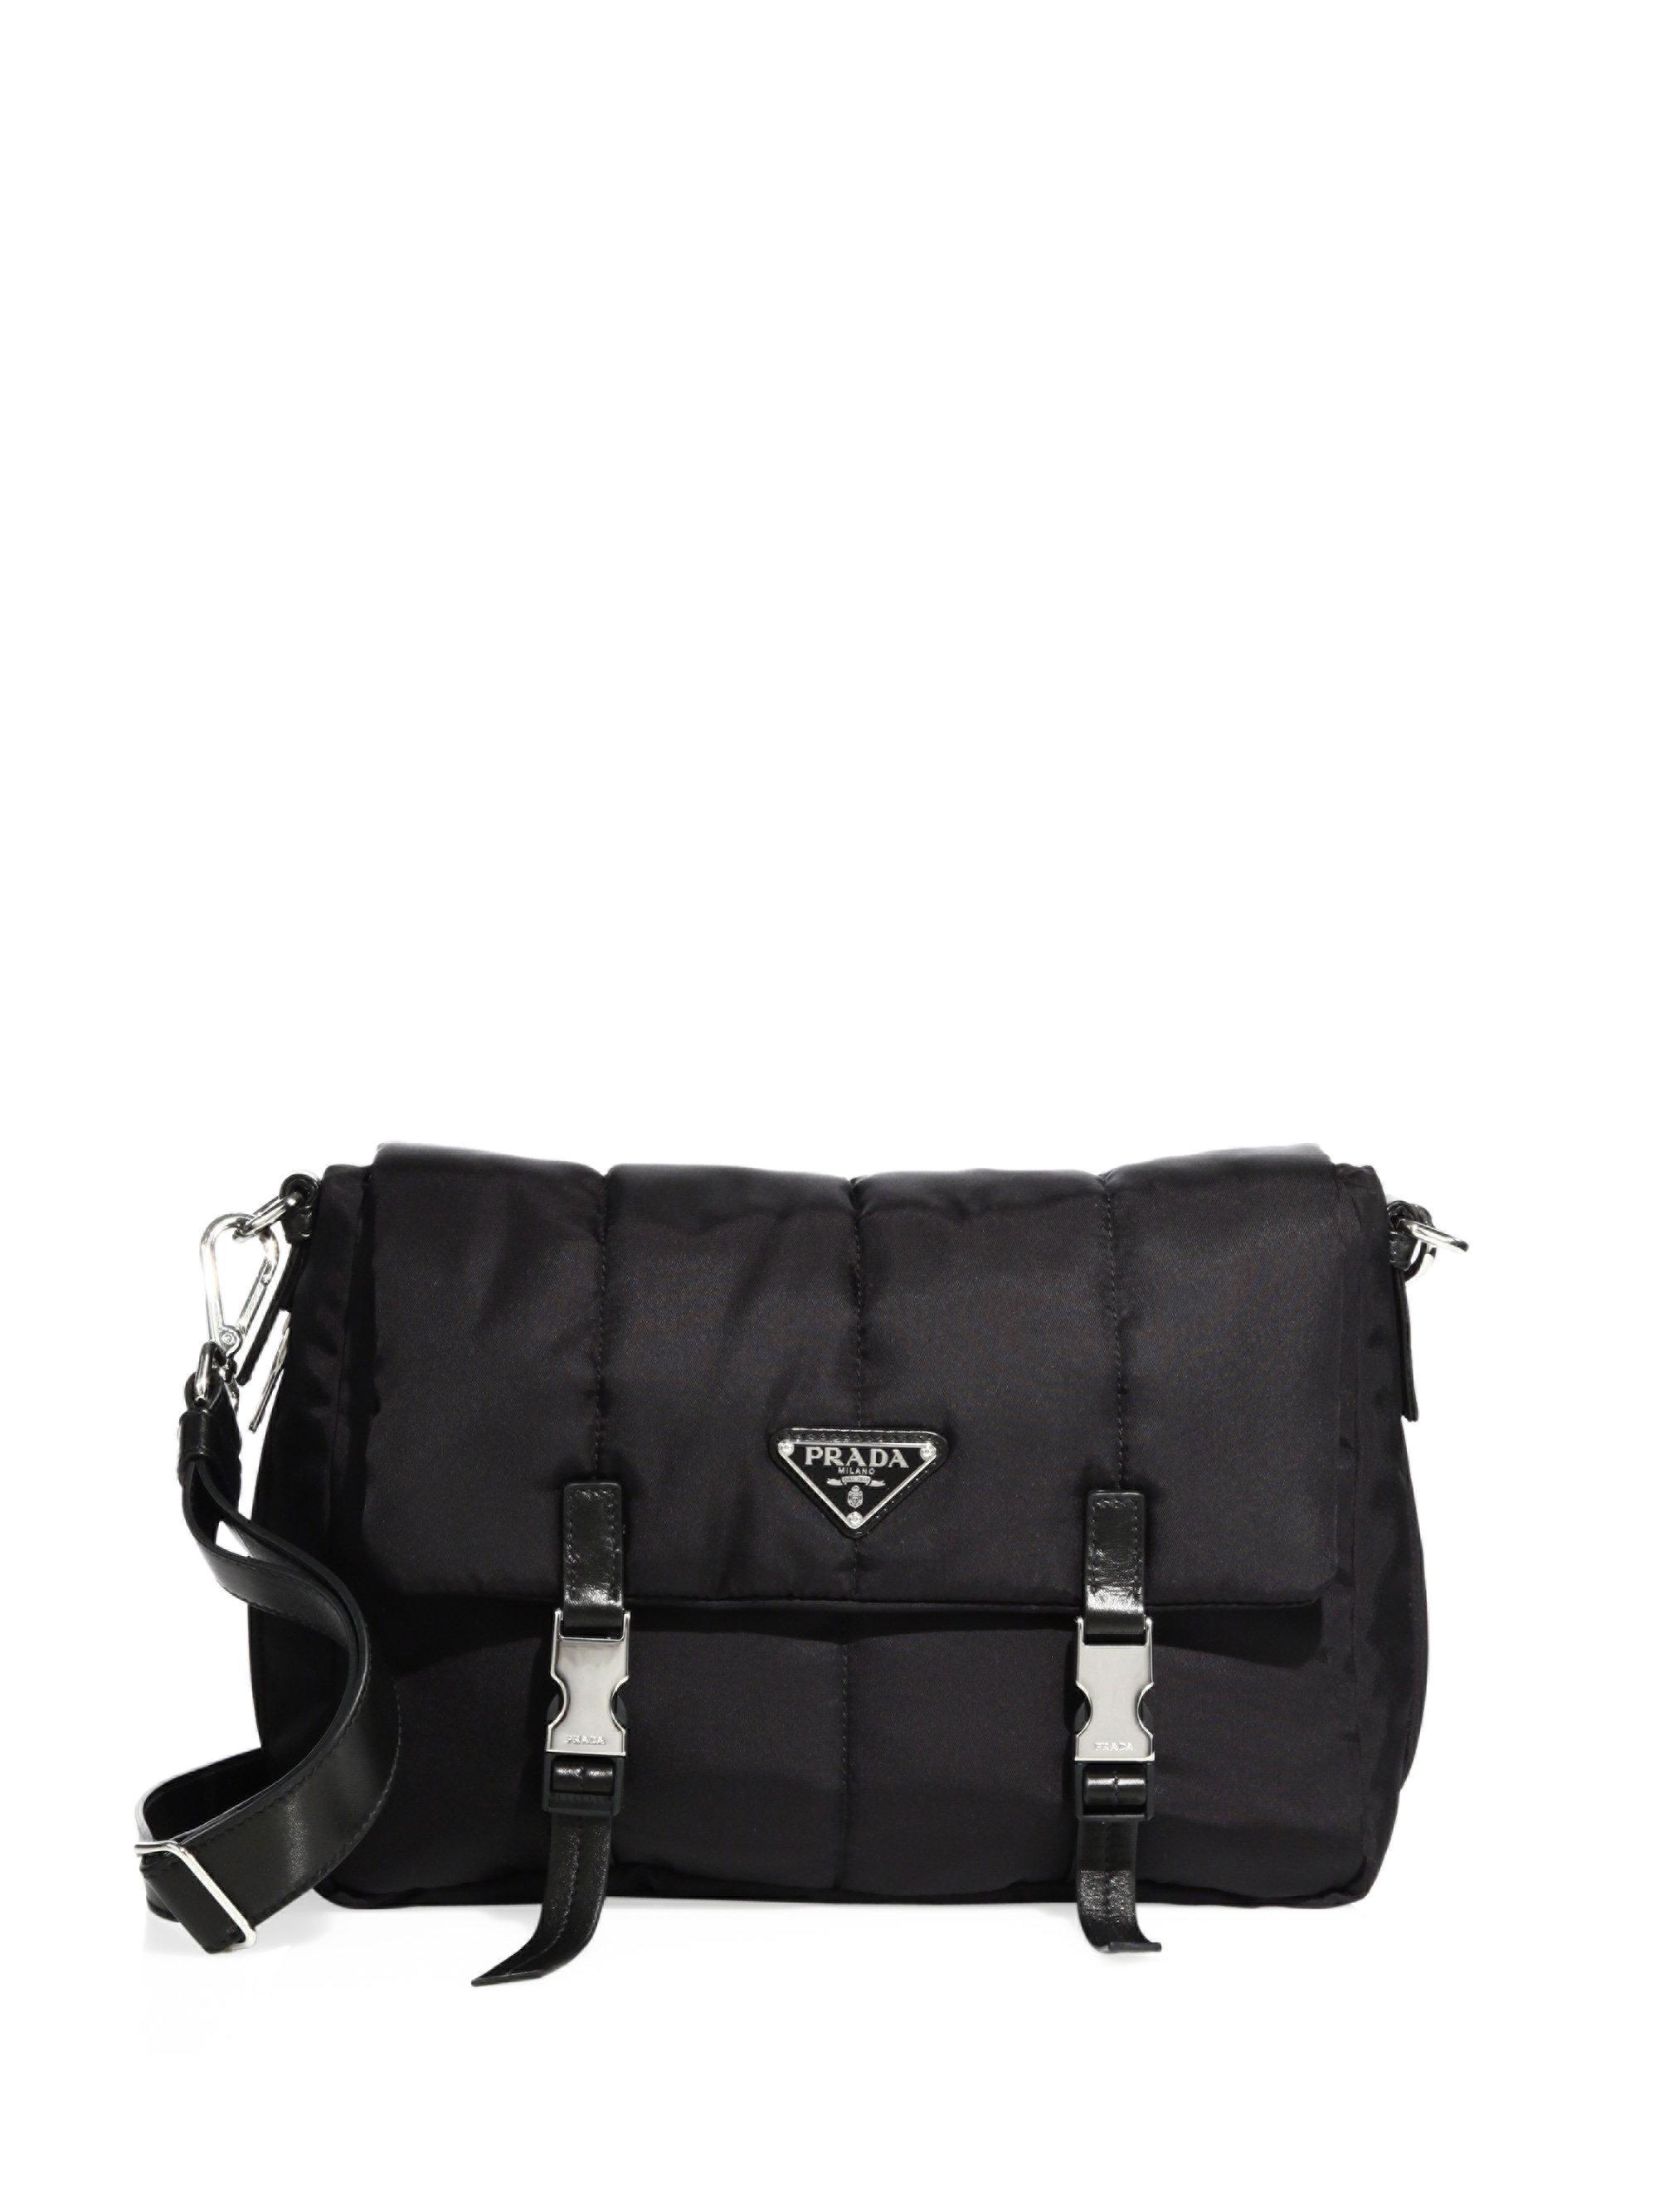 d20af0fb7784 Lyst - Prada Tessuto Nylon Bomber Messenger Bag in Black